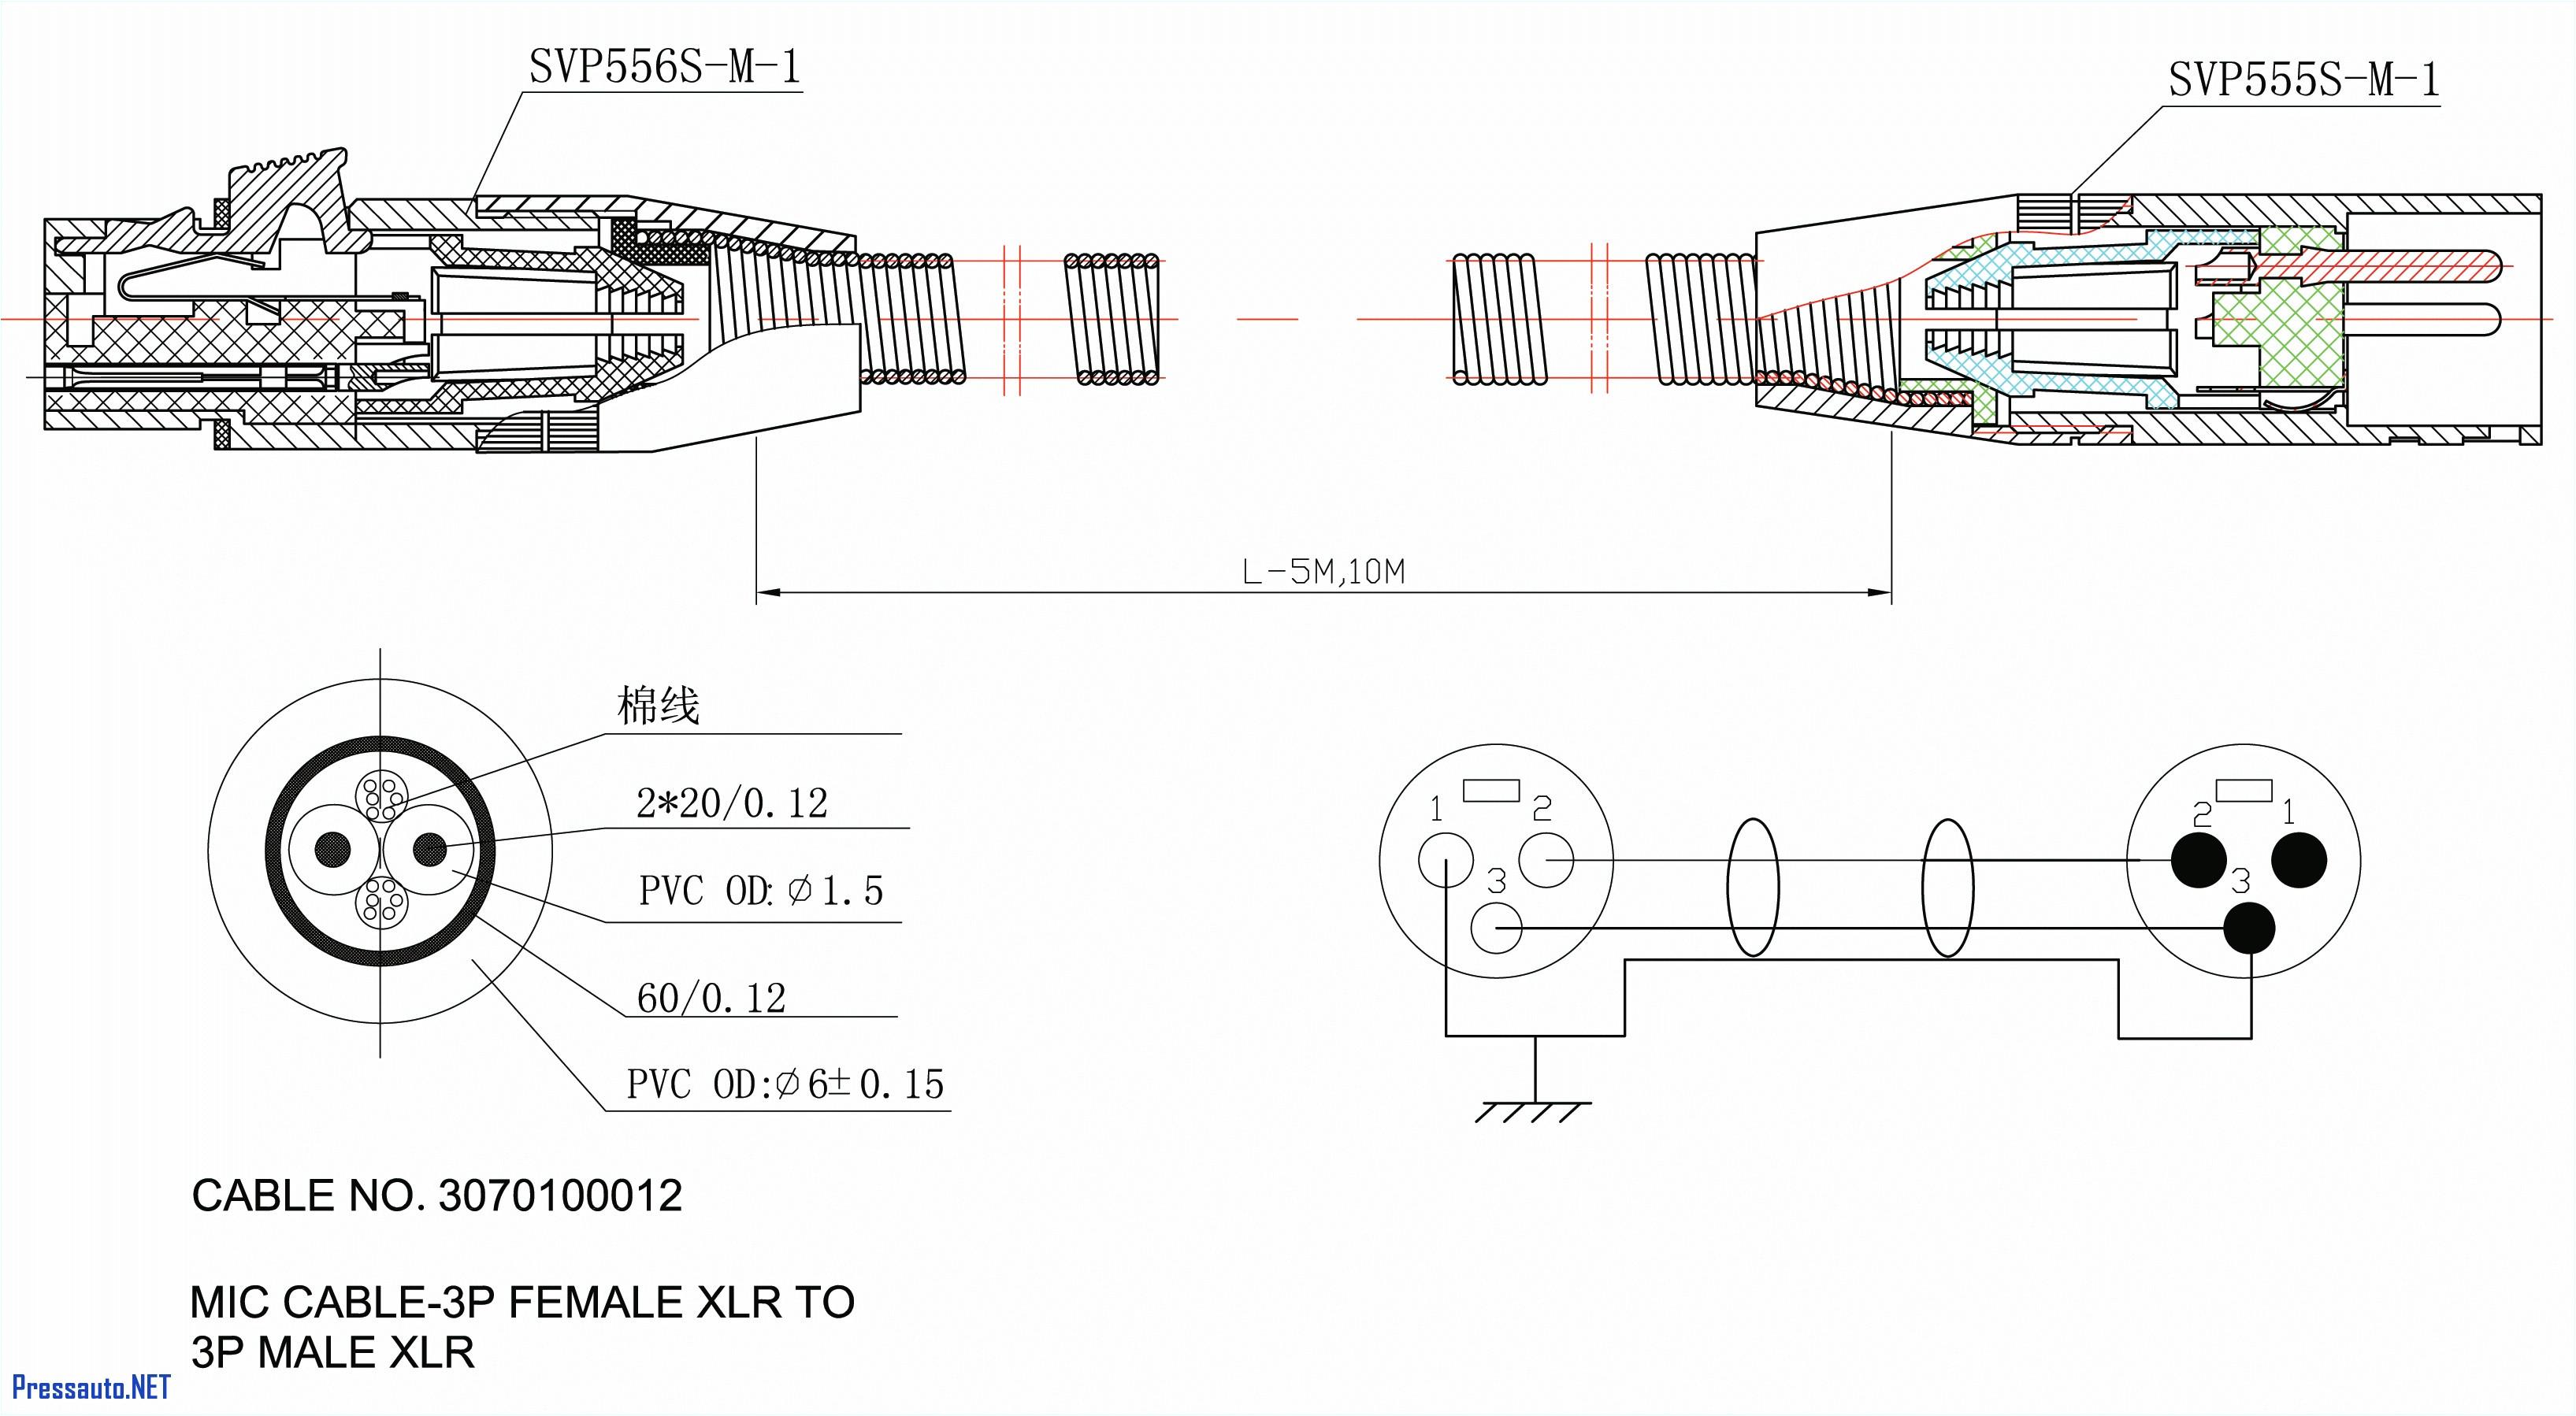 kenwood stereo wiring diagram fresh kenwood kdc bt852hd wiring diagram electrical circuit wiring diagram images of kenwood stereo wiring diagram jpg